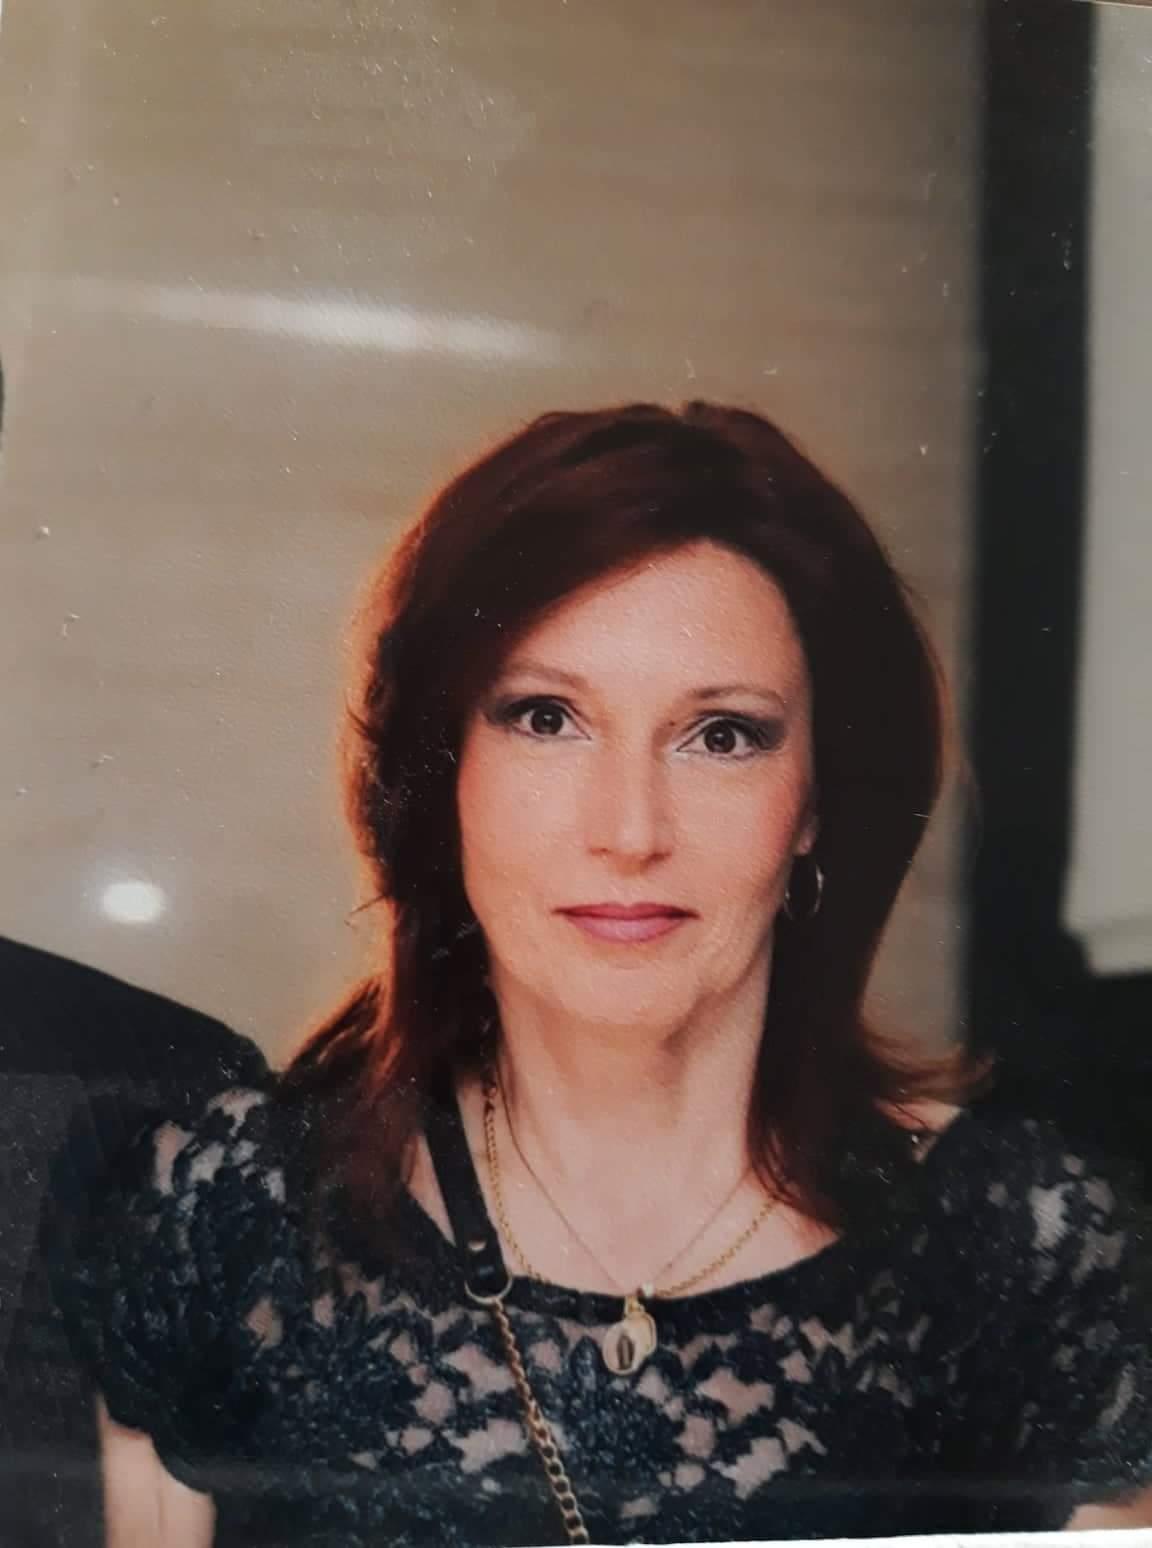 Д-р Ивана Йованович